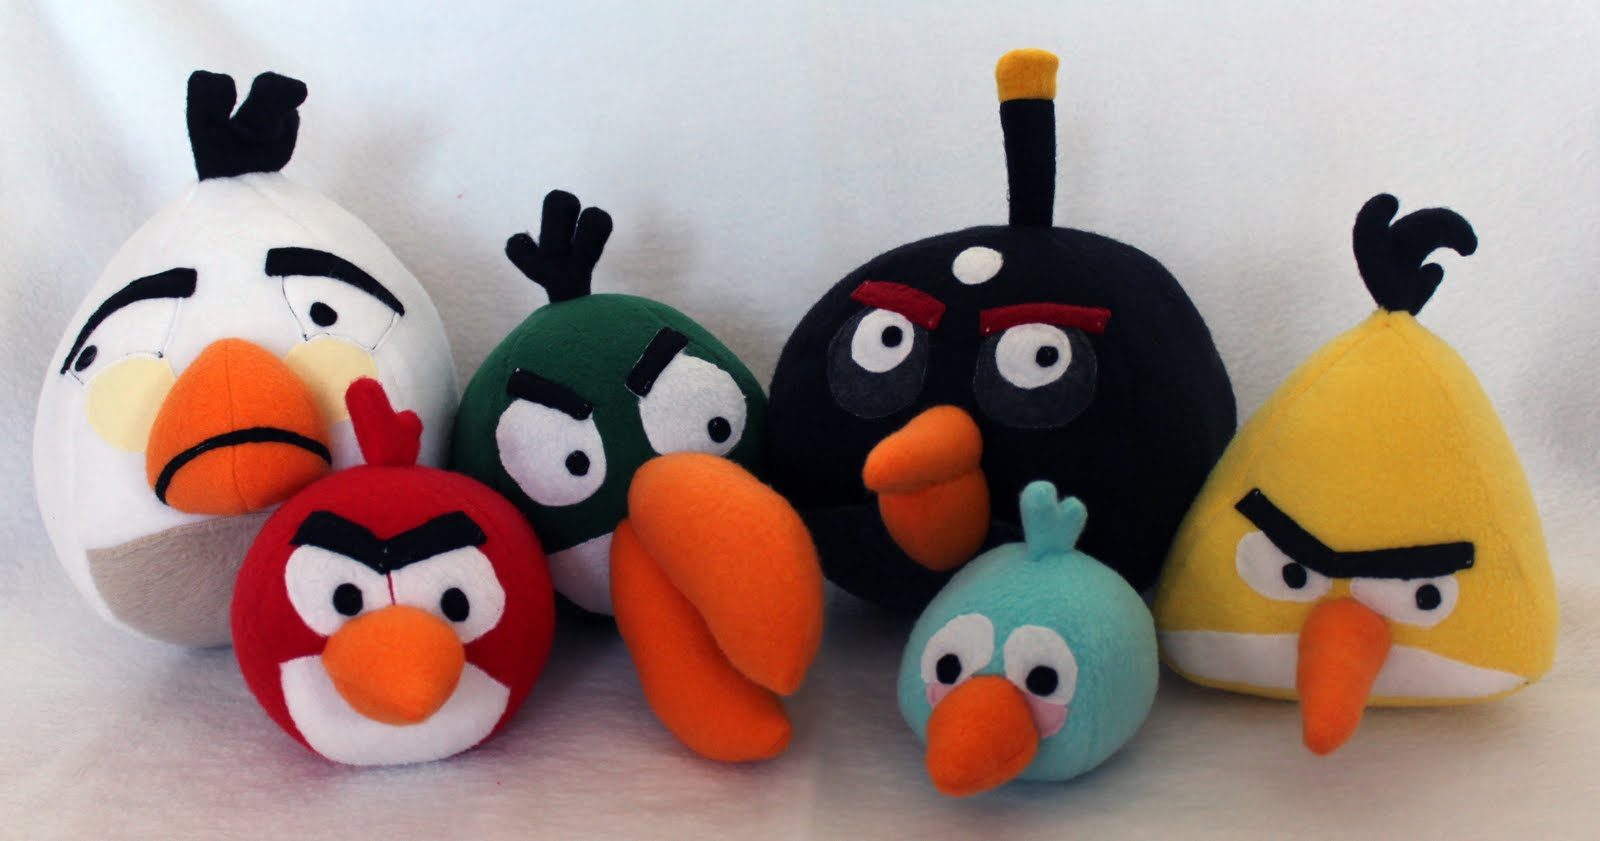 Crea Tus Propios Angry Birds